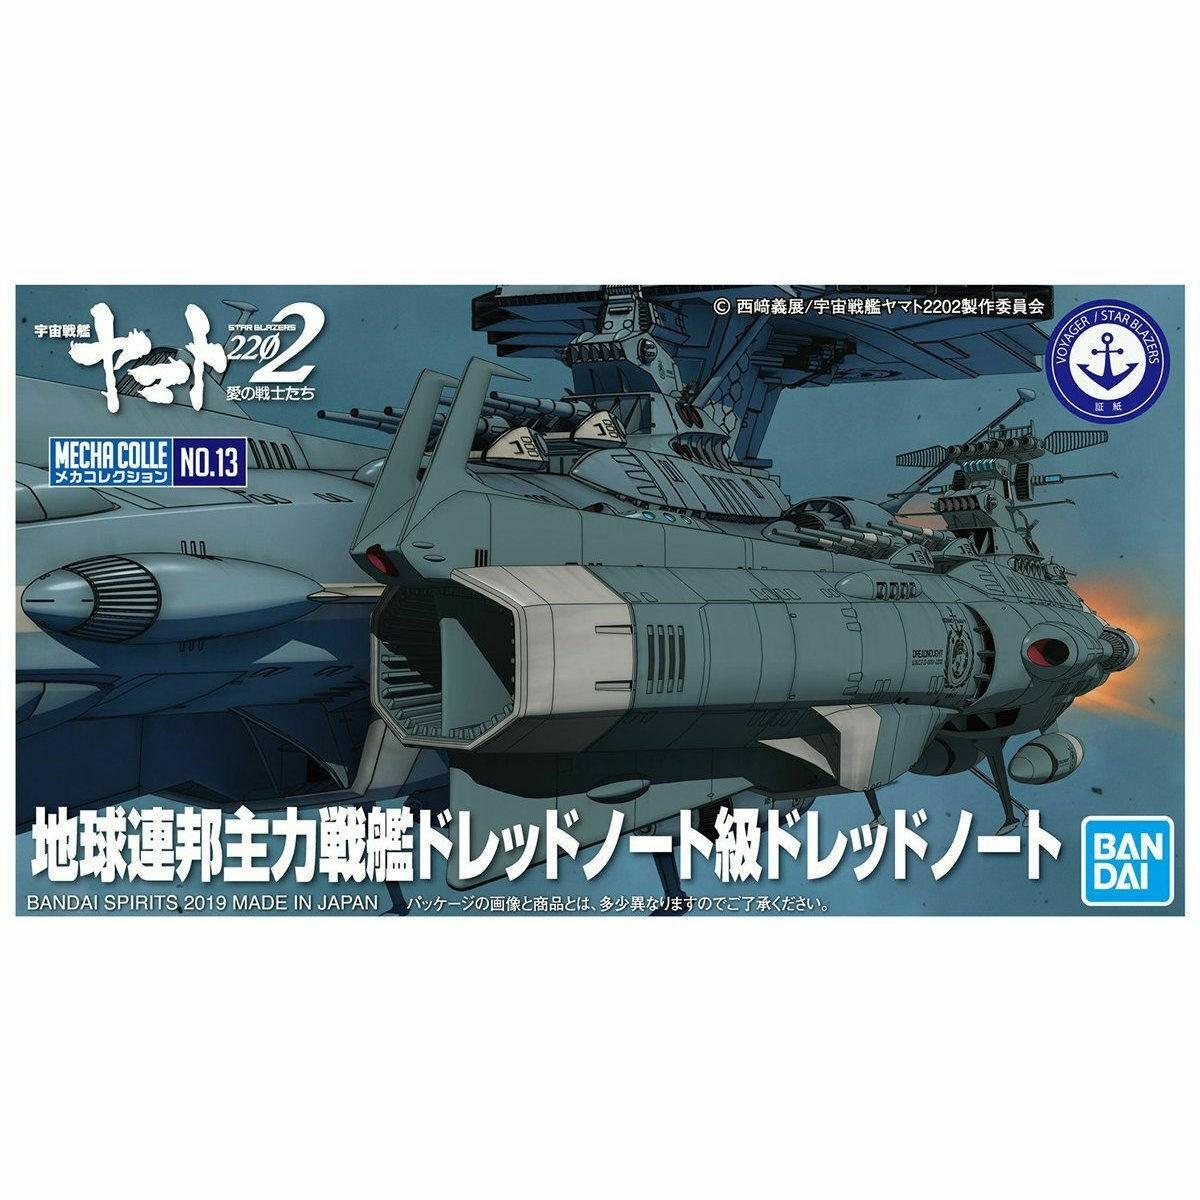 SPACE BATTLESHIP YAMATO 2202 MECHA COLLE No.13 - U.N.F.C D-1 DREADNOUGHT - PLASTIC MODEL KIT